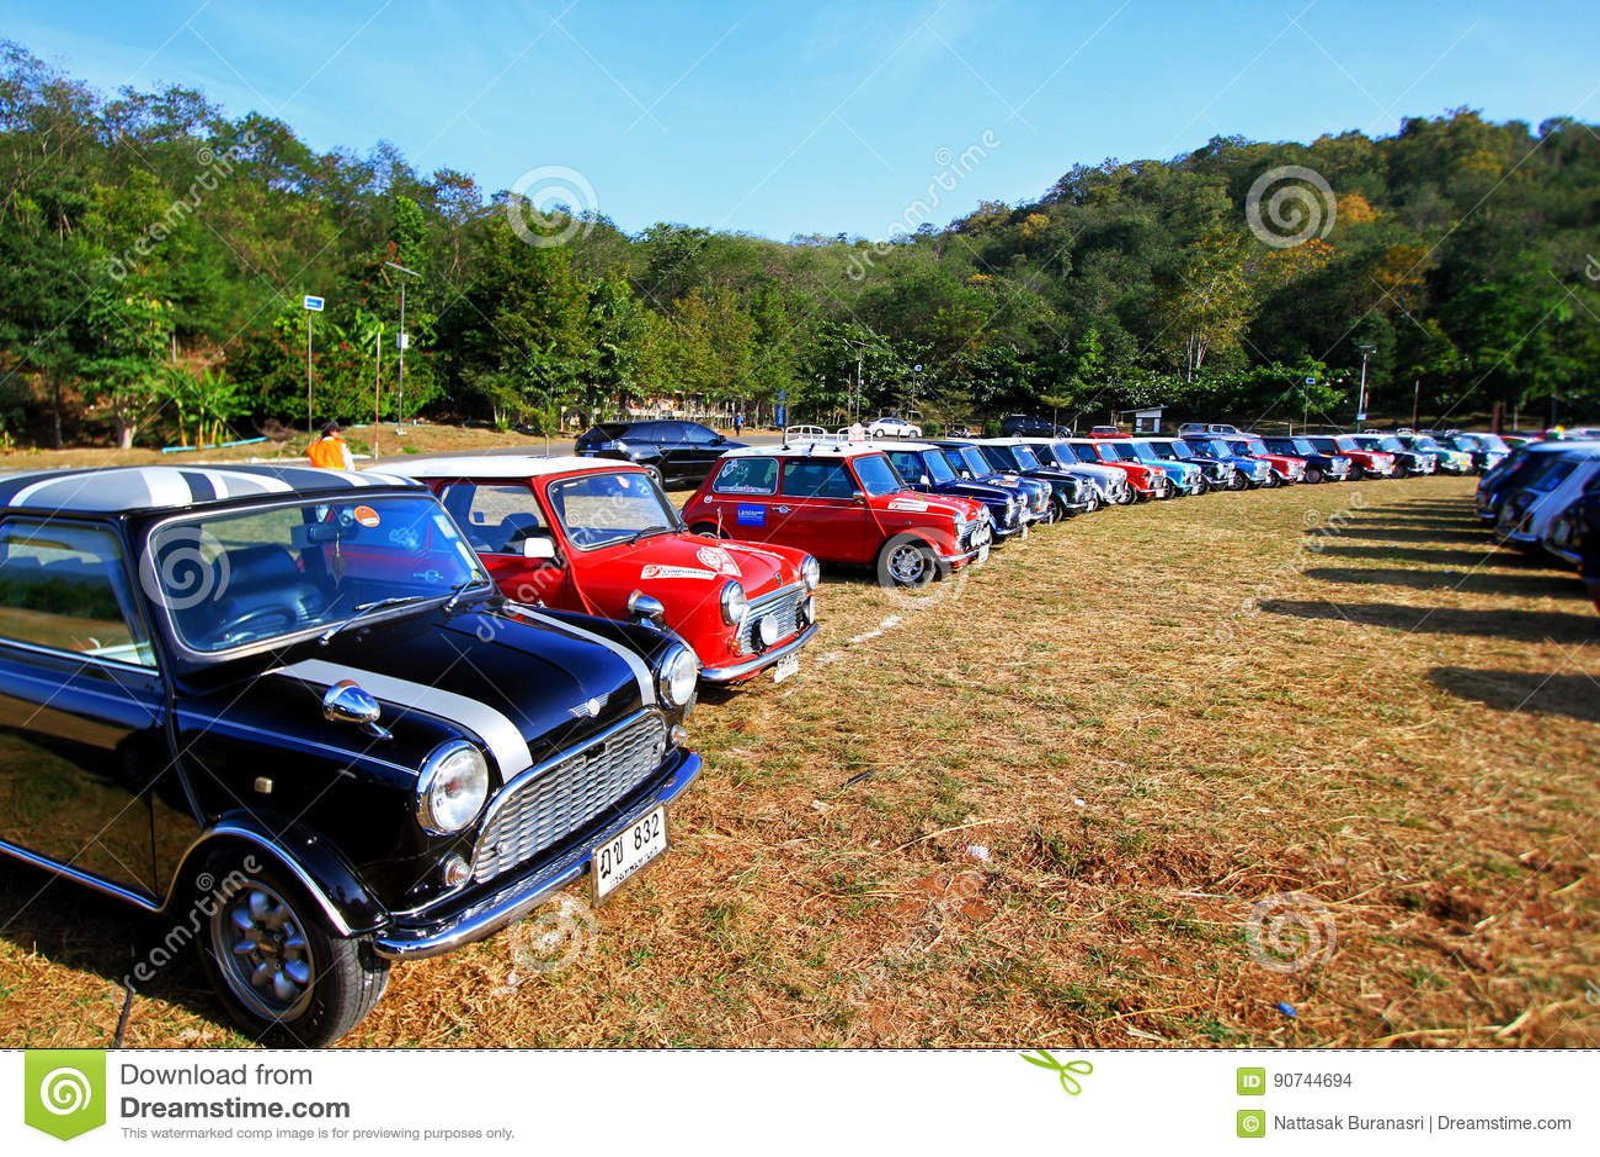 Nakhonratchasima, Ταϊλάνδη - 20 Δεκεμβρίου 2014: Πολλοί κλασικό Ώστιν Mini Cooper στο μίνι φεστιβάλ βουνών της μίνι οικογένειας τ